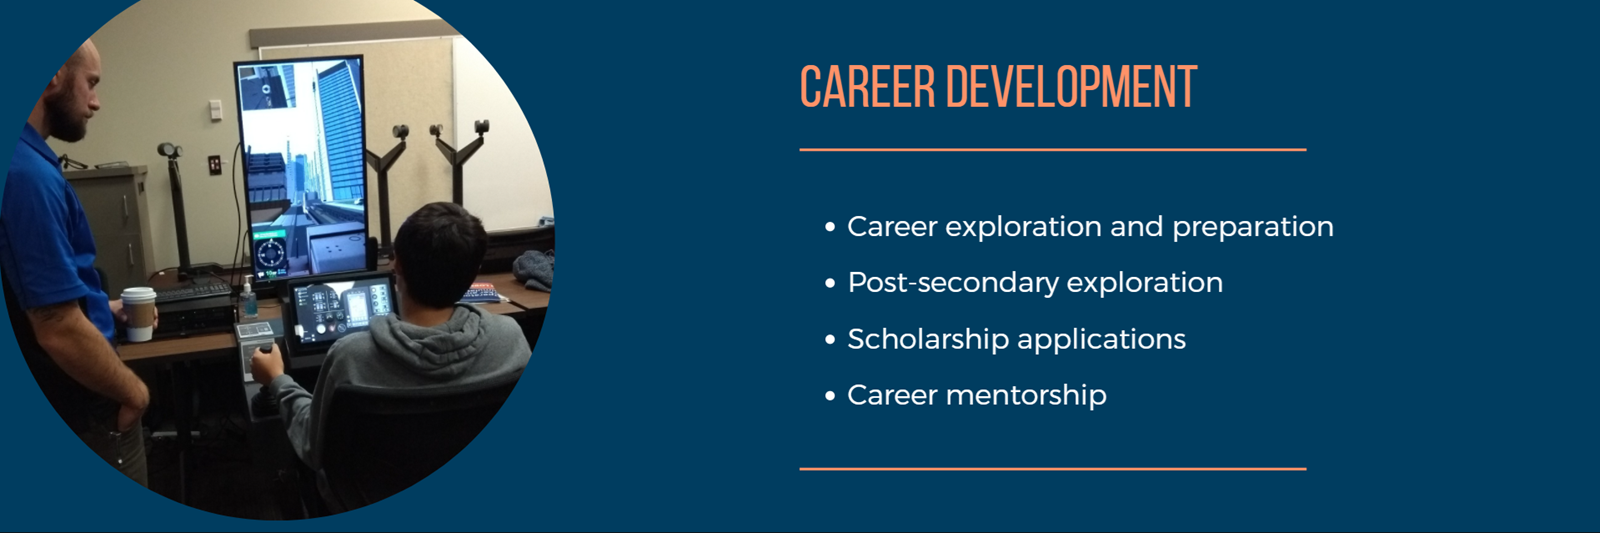 03 Career Development BrJrys-1.png